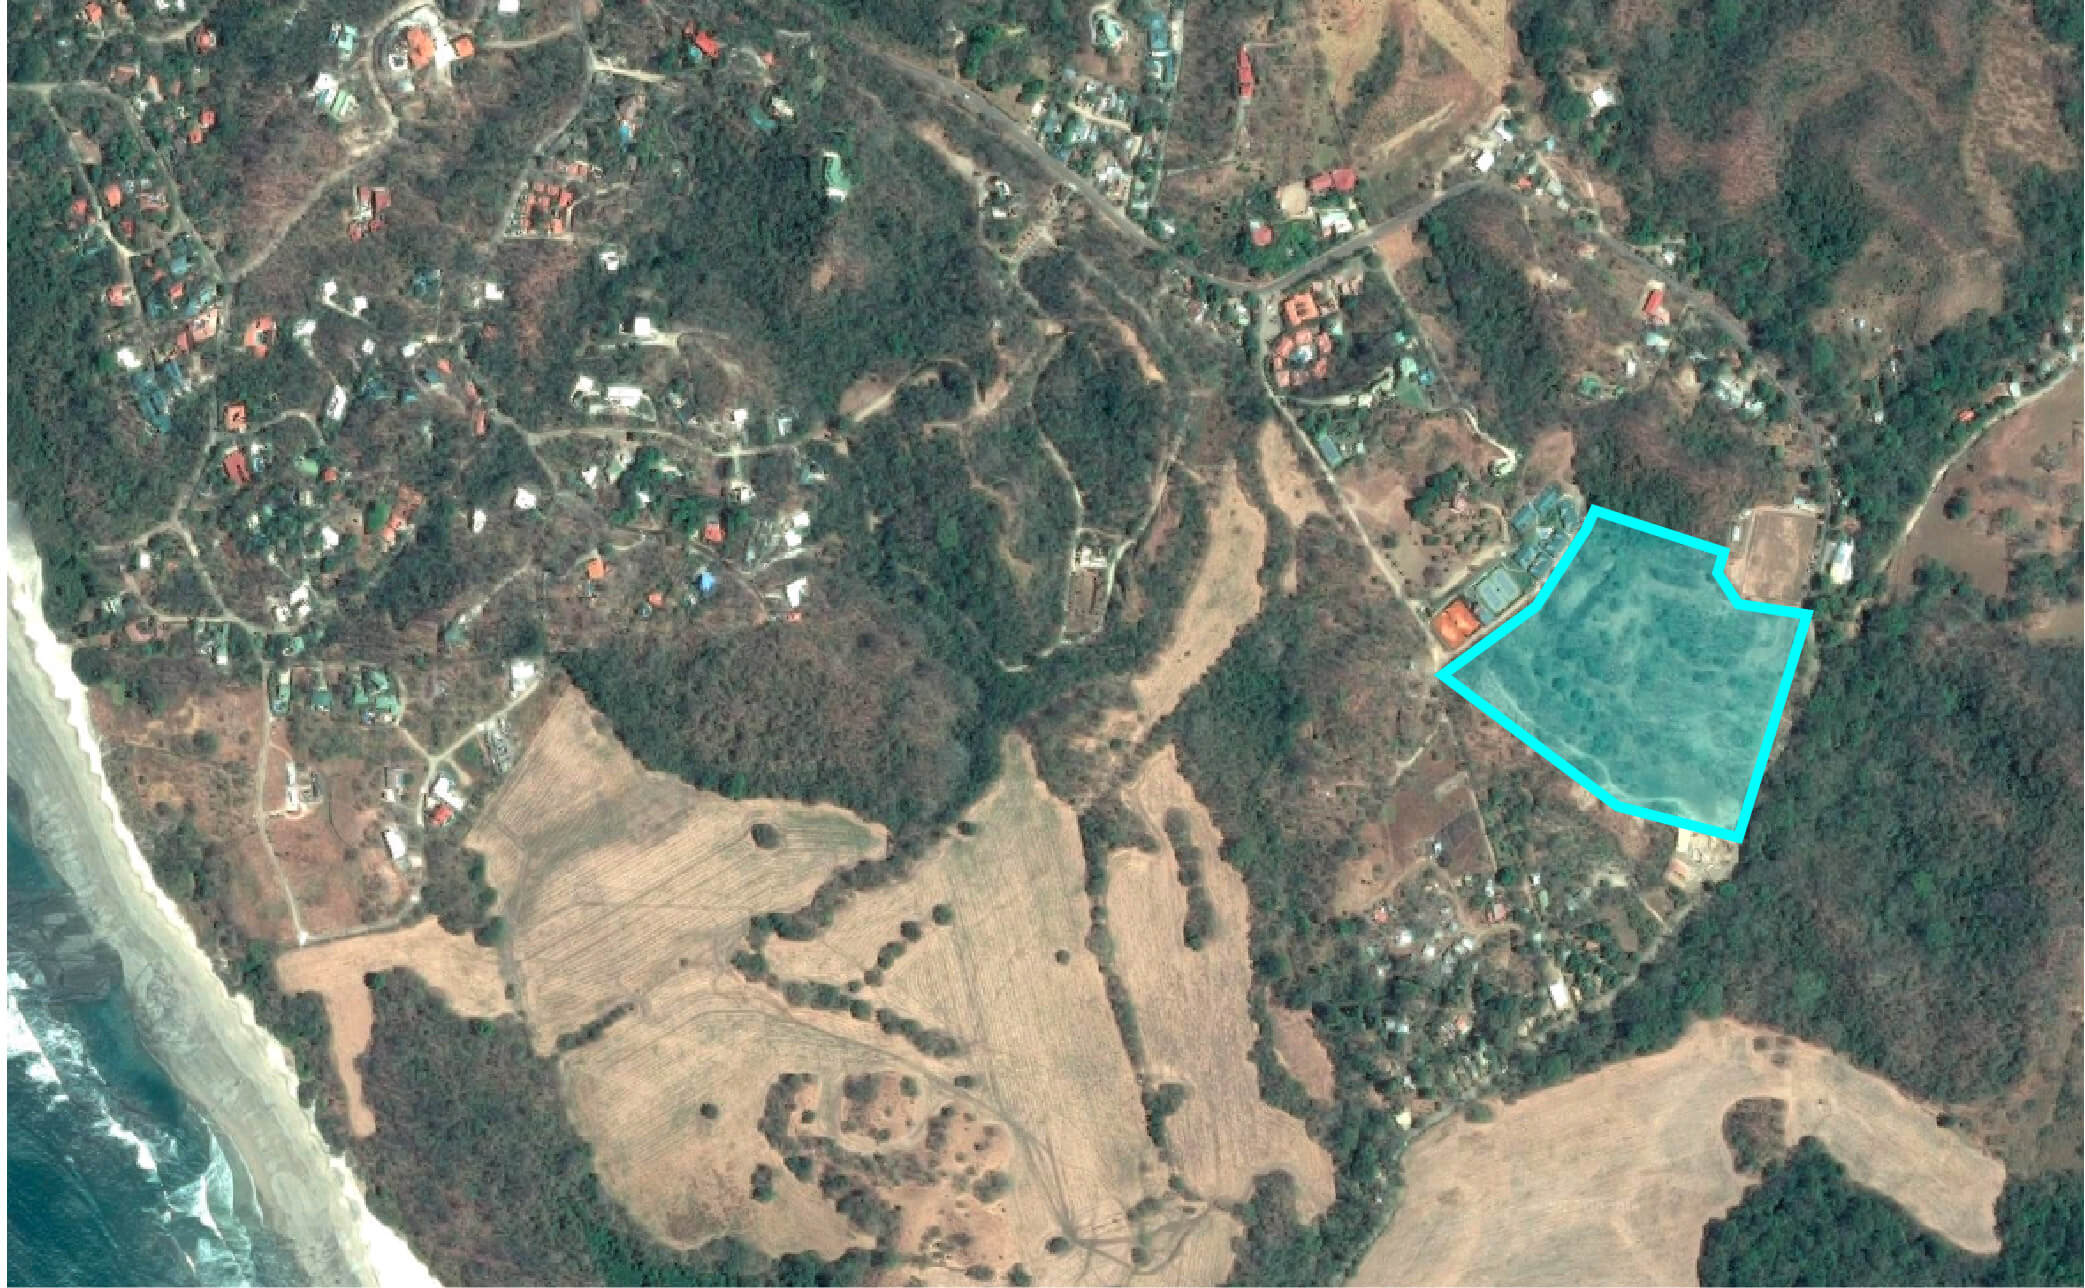 Aerial-Finca-Espanca-1-01.jpg